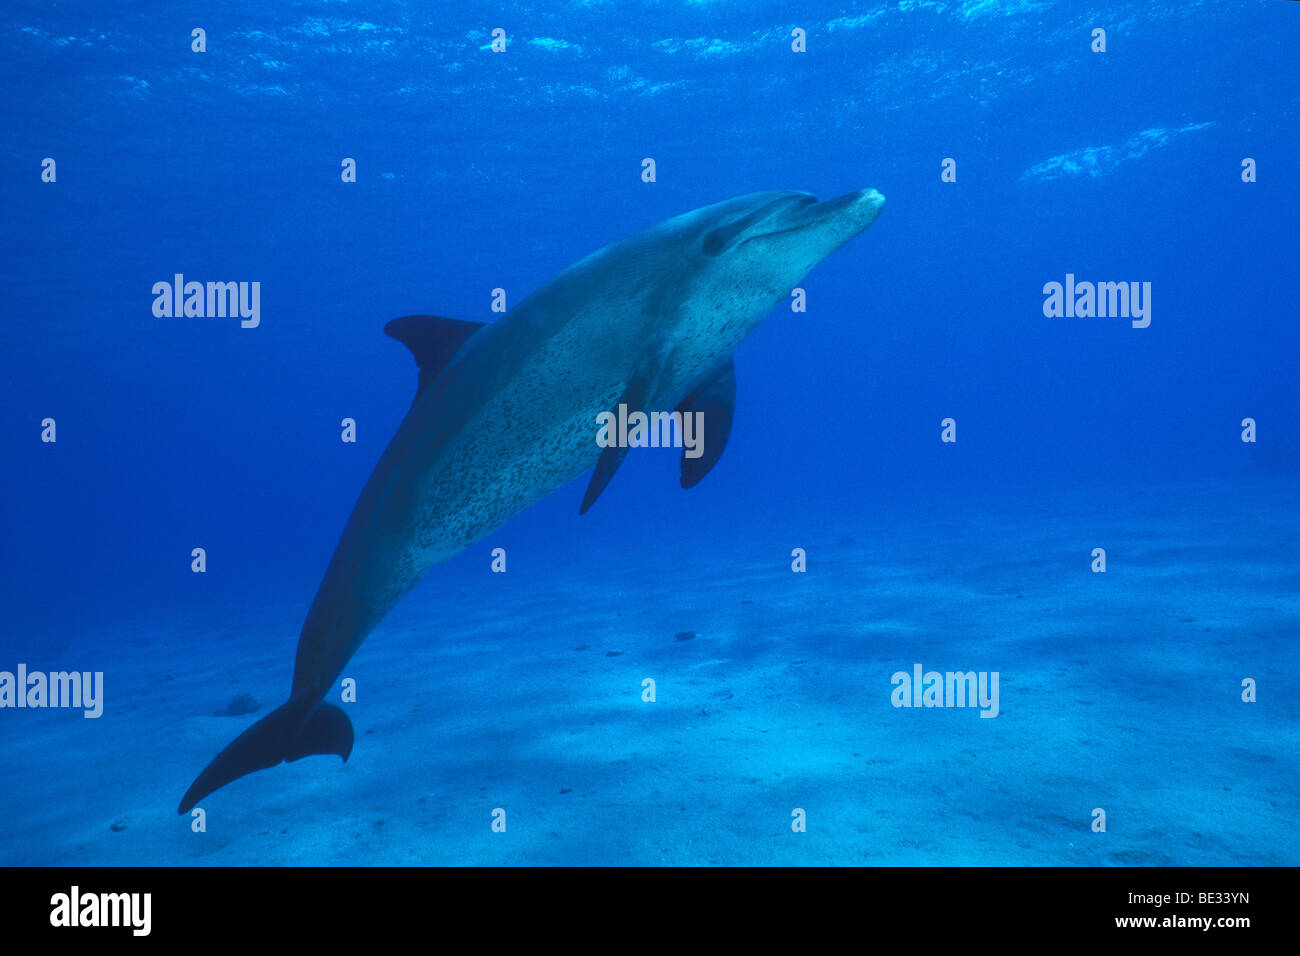 Bottlenose Dolphin, Tursiops truncatus, Nuweiba, Sinai, Red Sea, Egypt - Stock Image